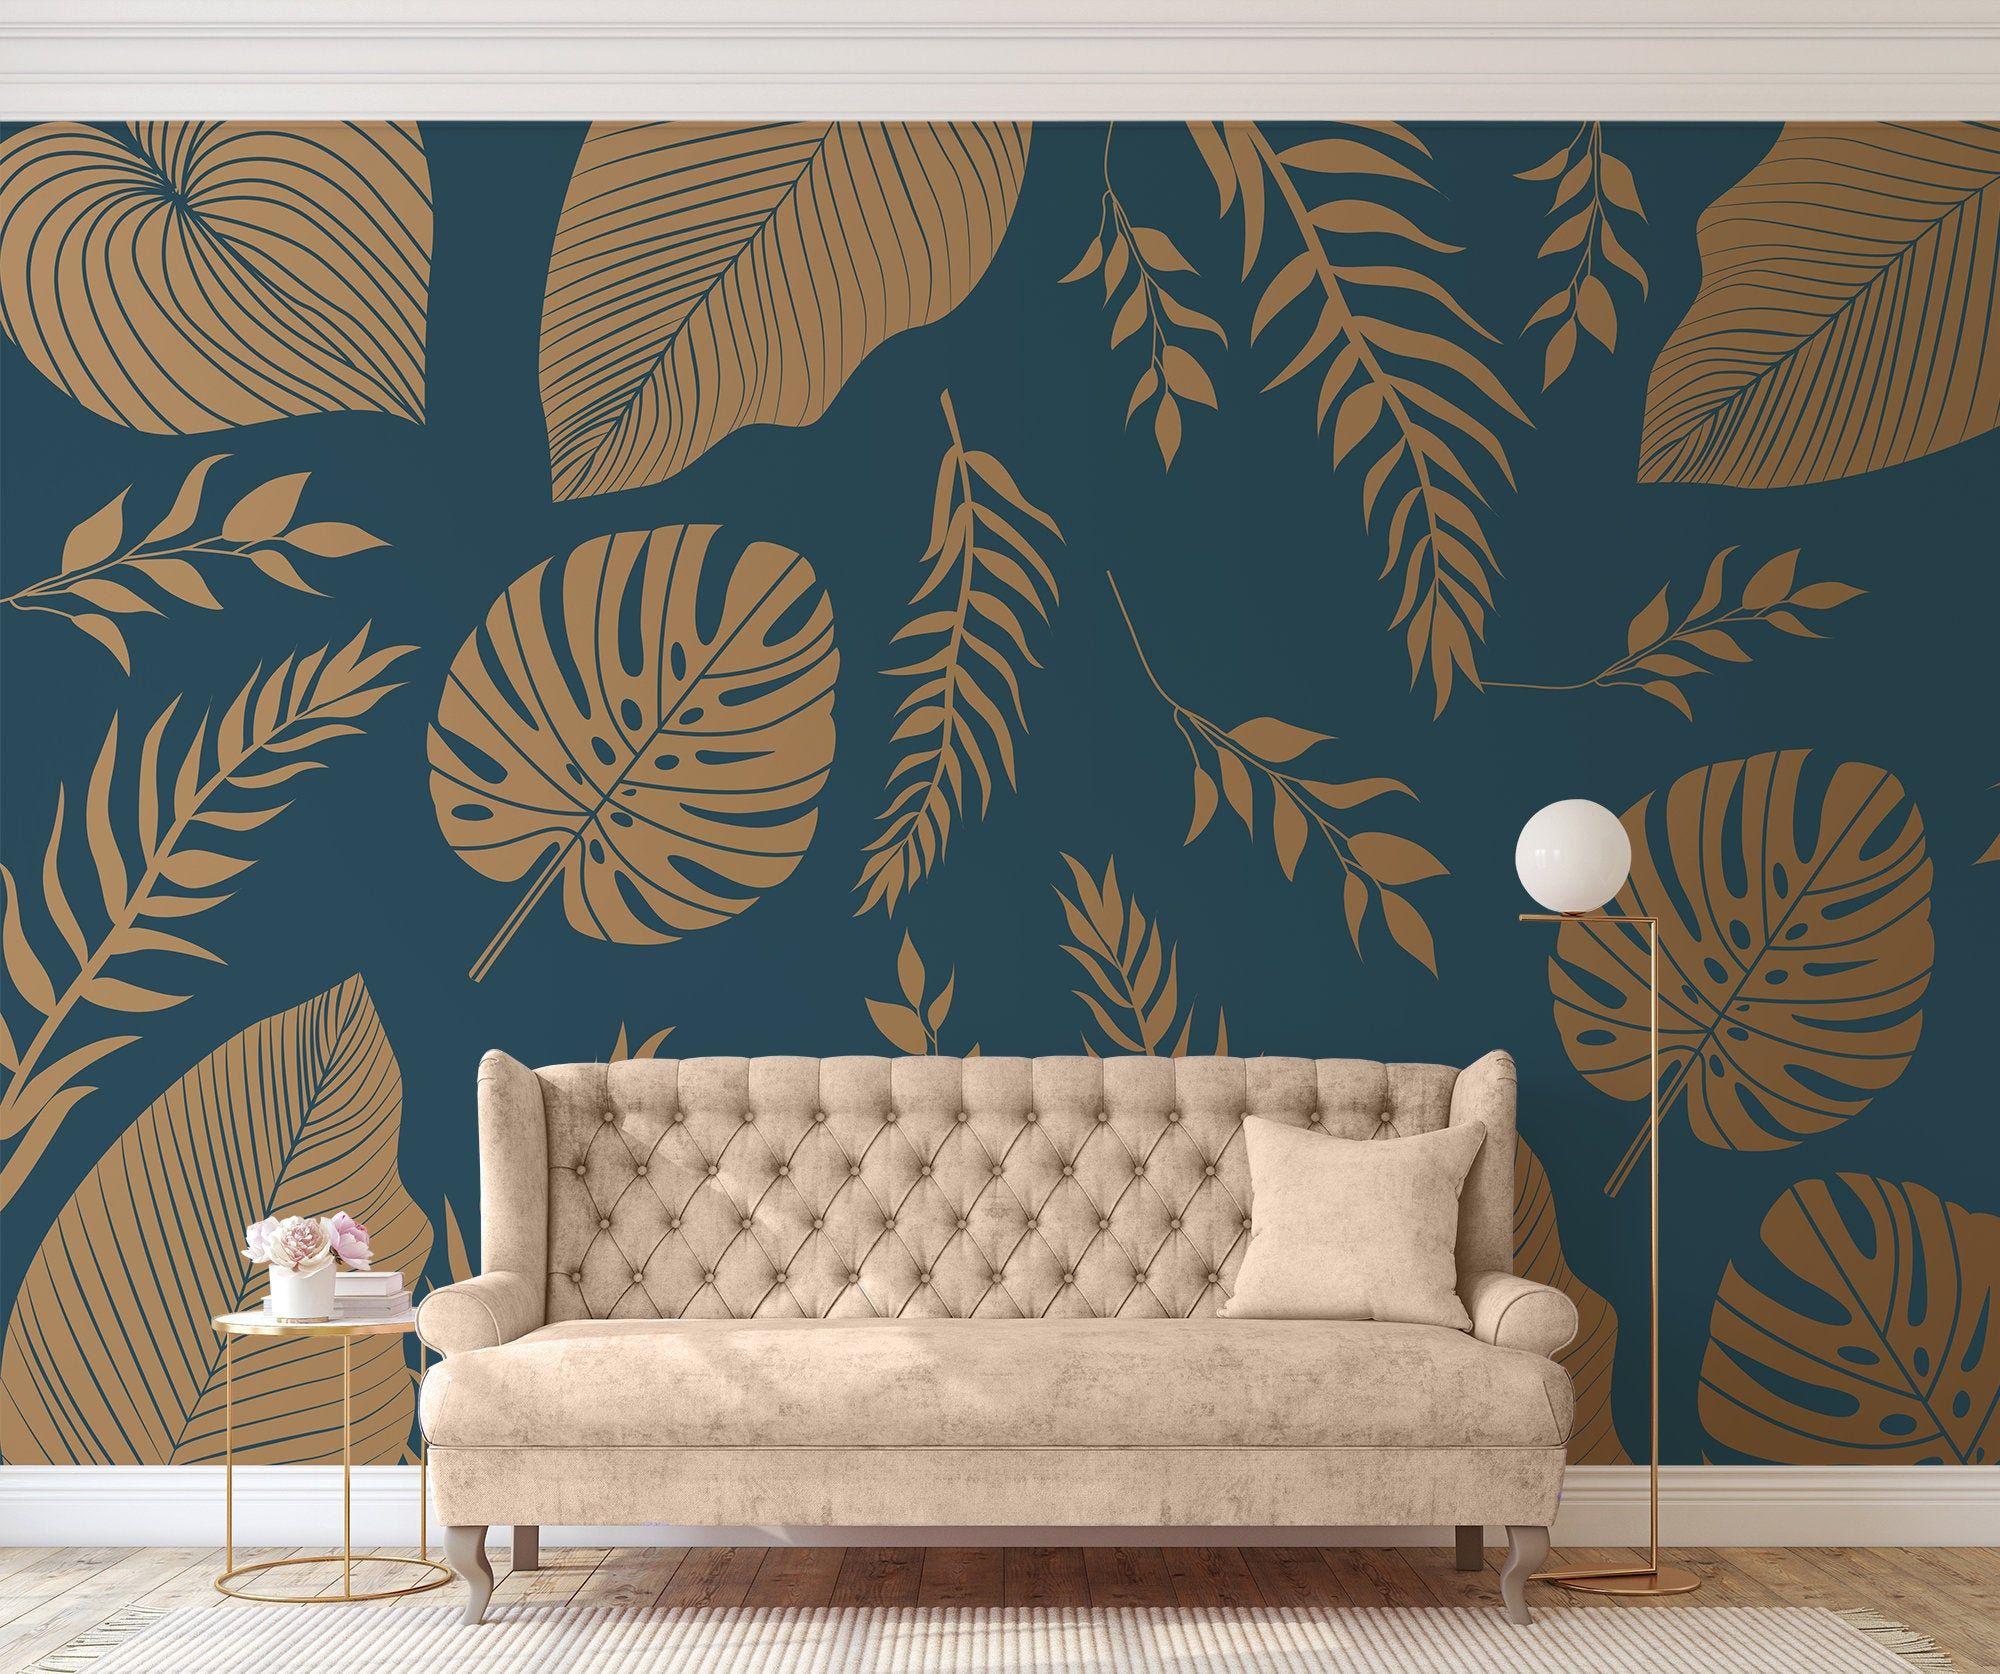 Teal wallpaper with gold monstera Self adhesive Peel